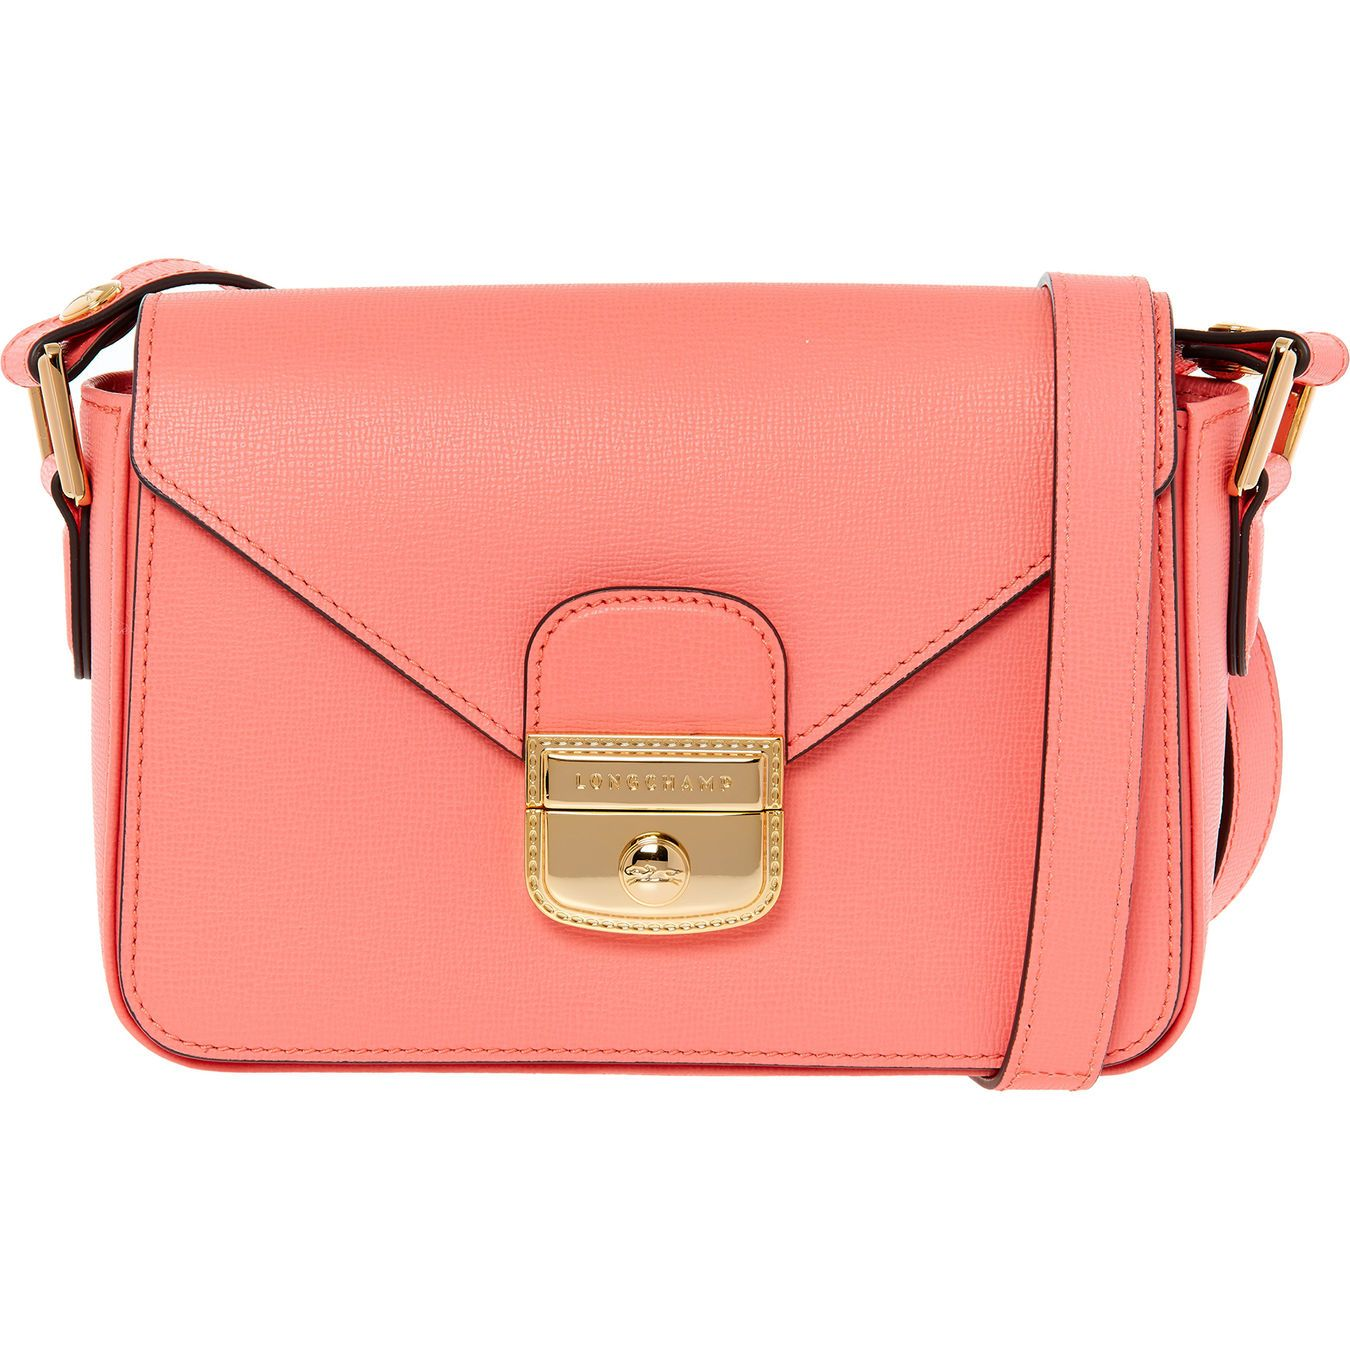 Pink Leather Cross Body Bag Handbags Accessories